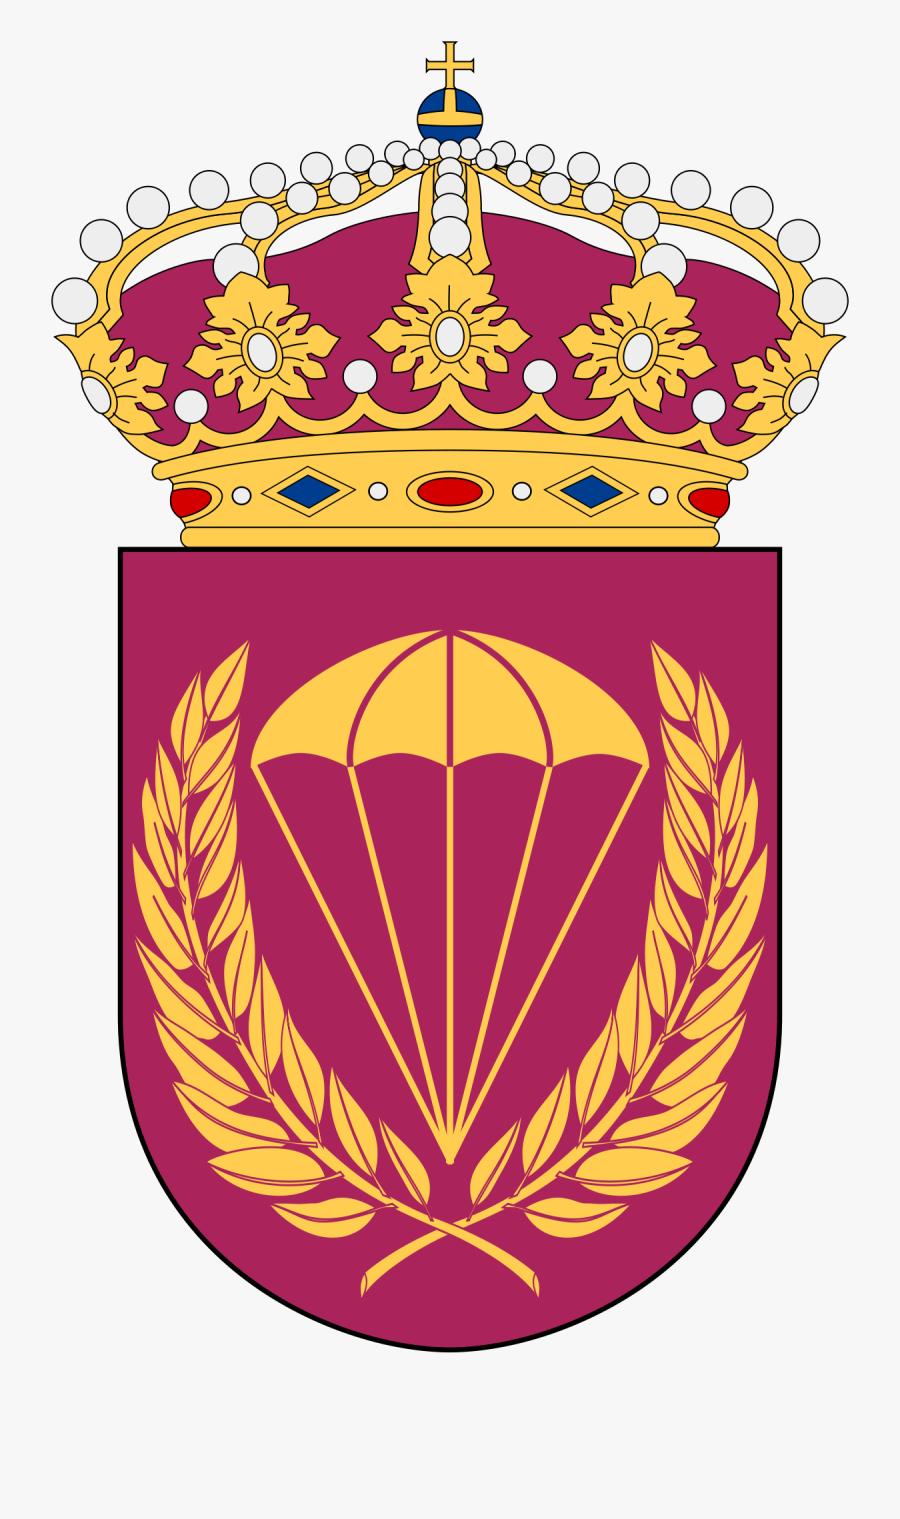 National Defence Radio Establishment, Transparent Clipart